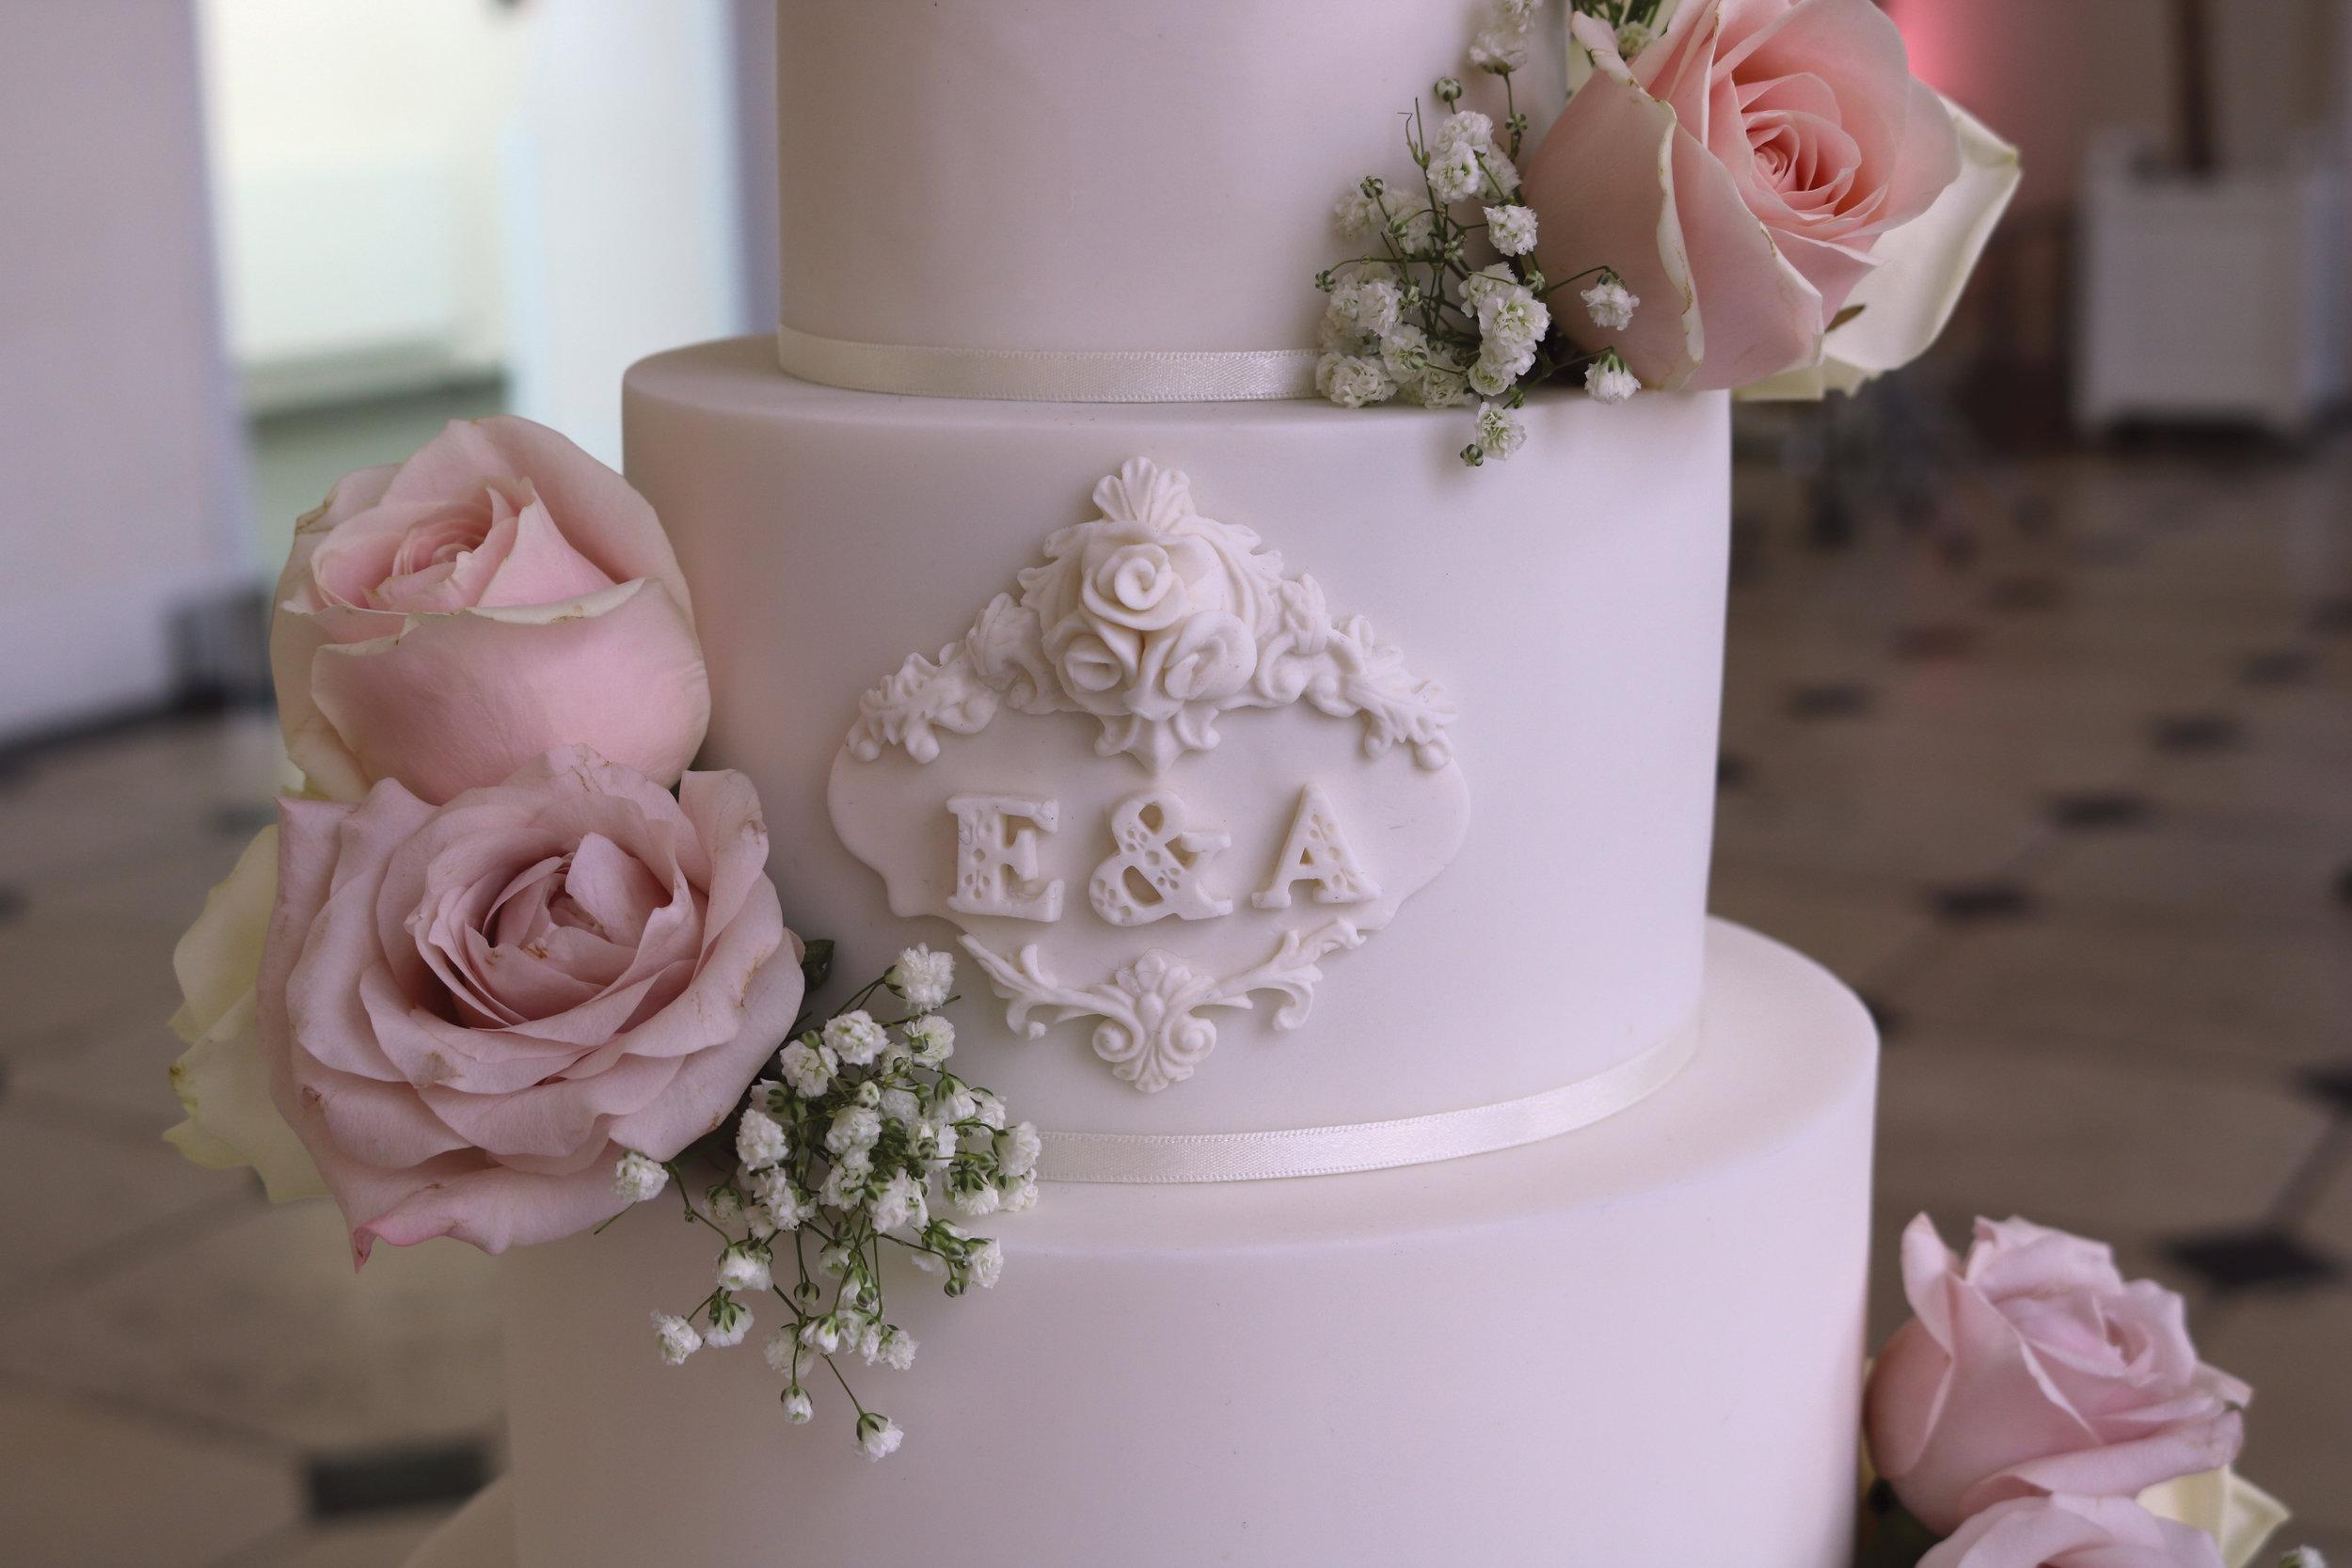 details of this elegant monogrammed wedding cake at Kew Gardens Orangery in West London